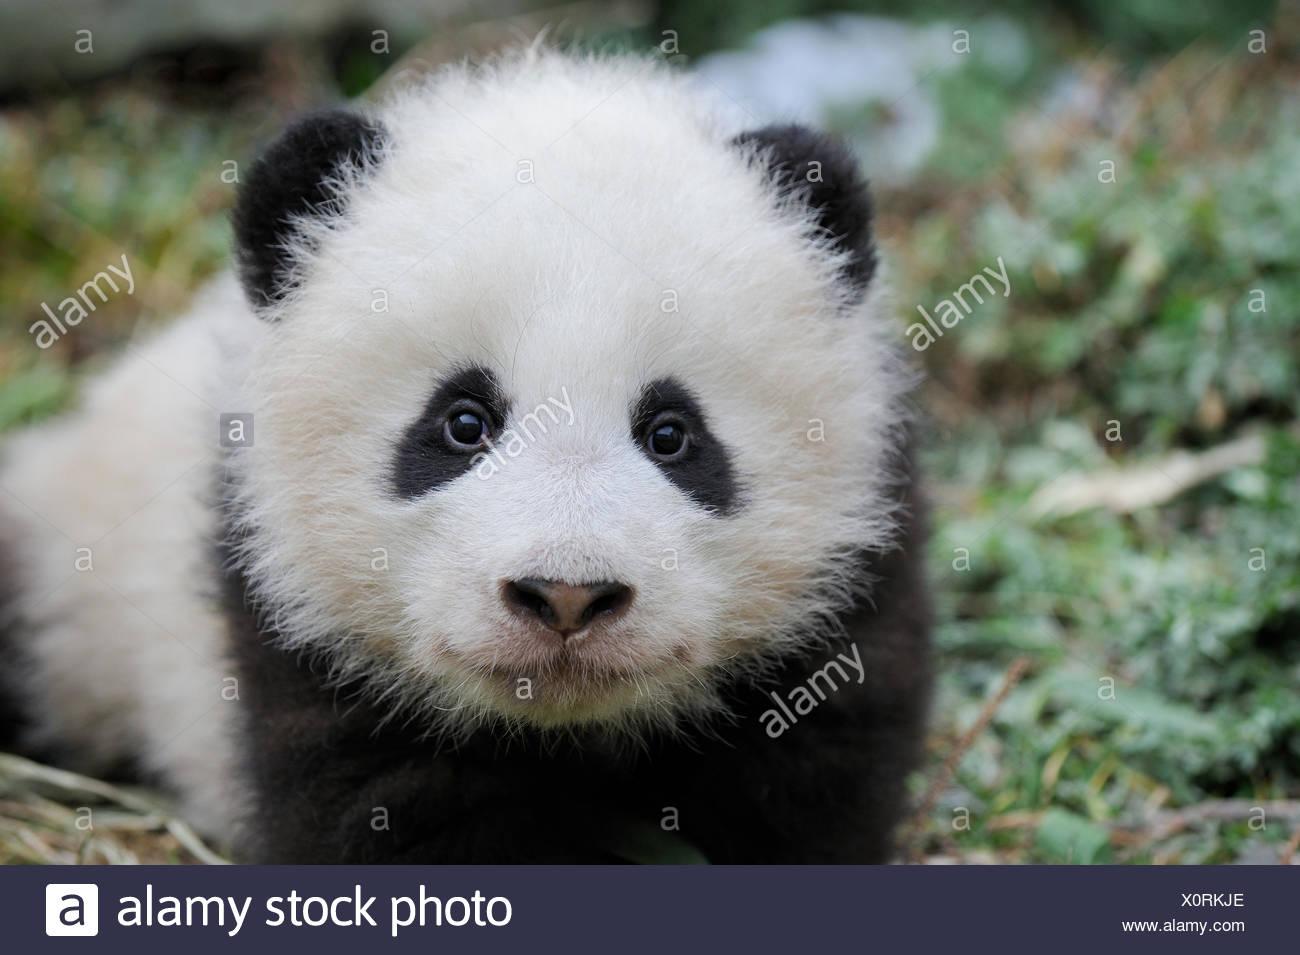 Head portrait of Giant panda  (Ailuropoda melanoleuca) cub aged 5 months. Wolong Nature Reserve, Wenchuan, Sichuan Province, China. Captive. - Stock Image